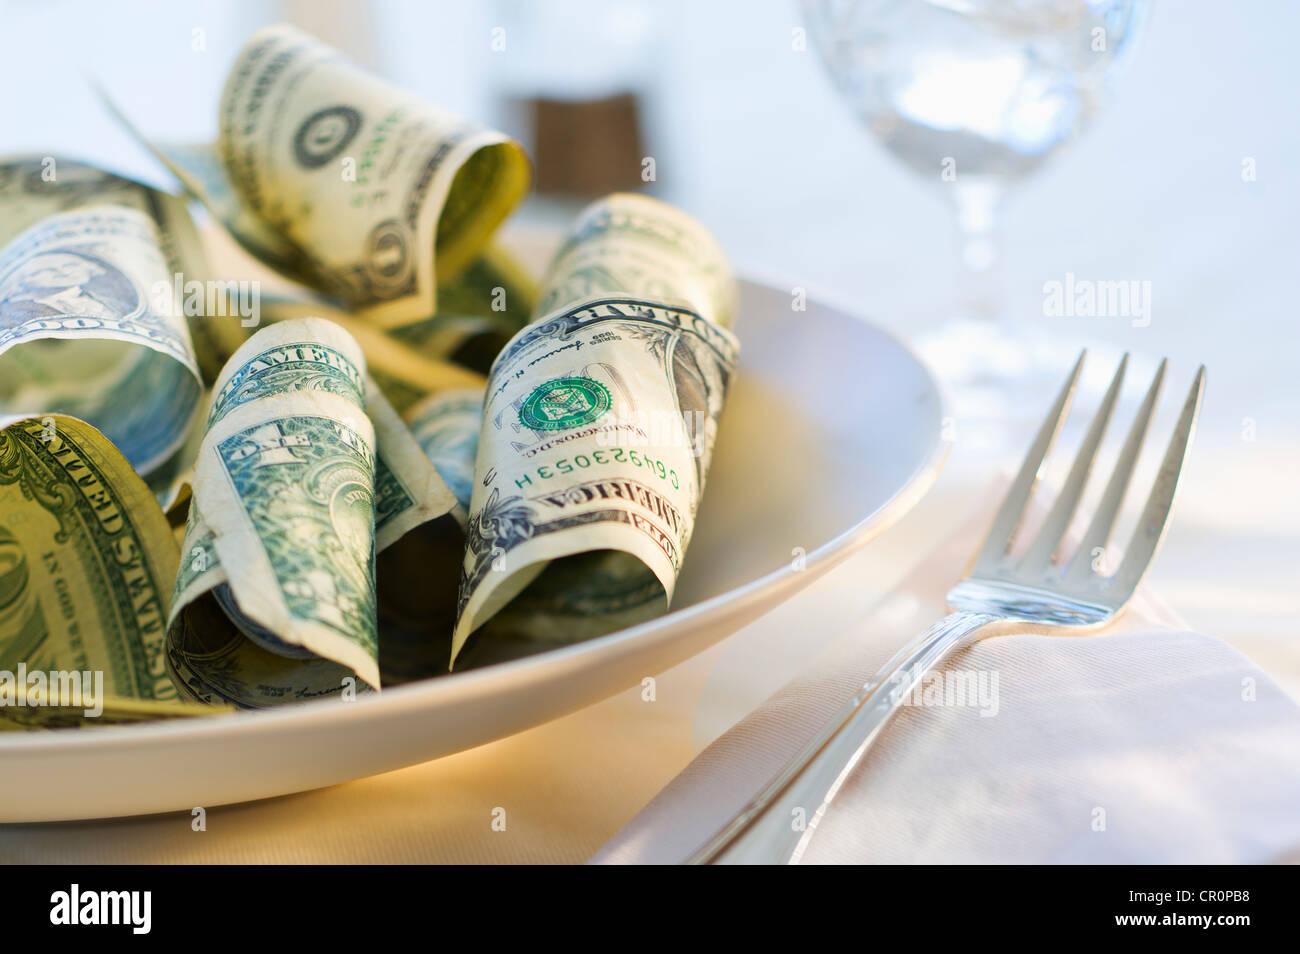 Carta moneta sulla piastra di cena, studio shot Foto Stock